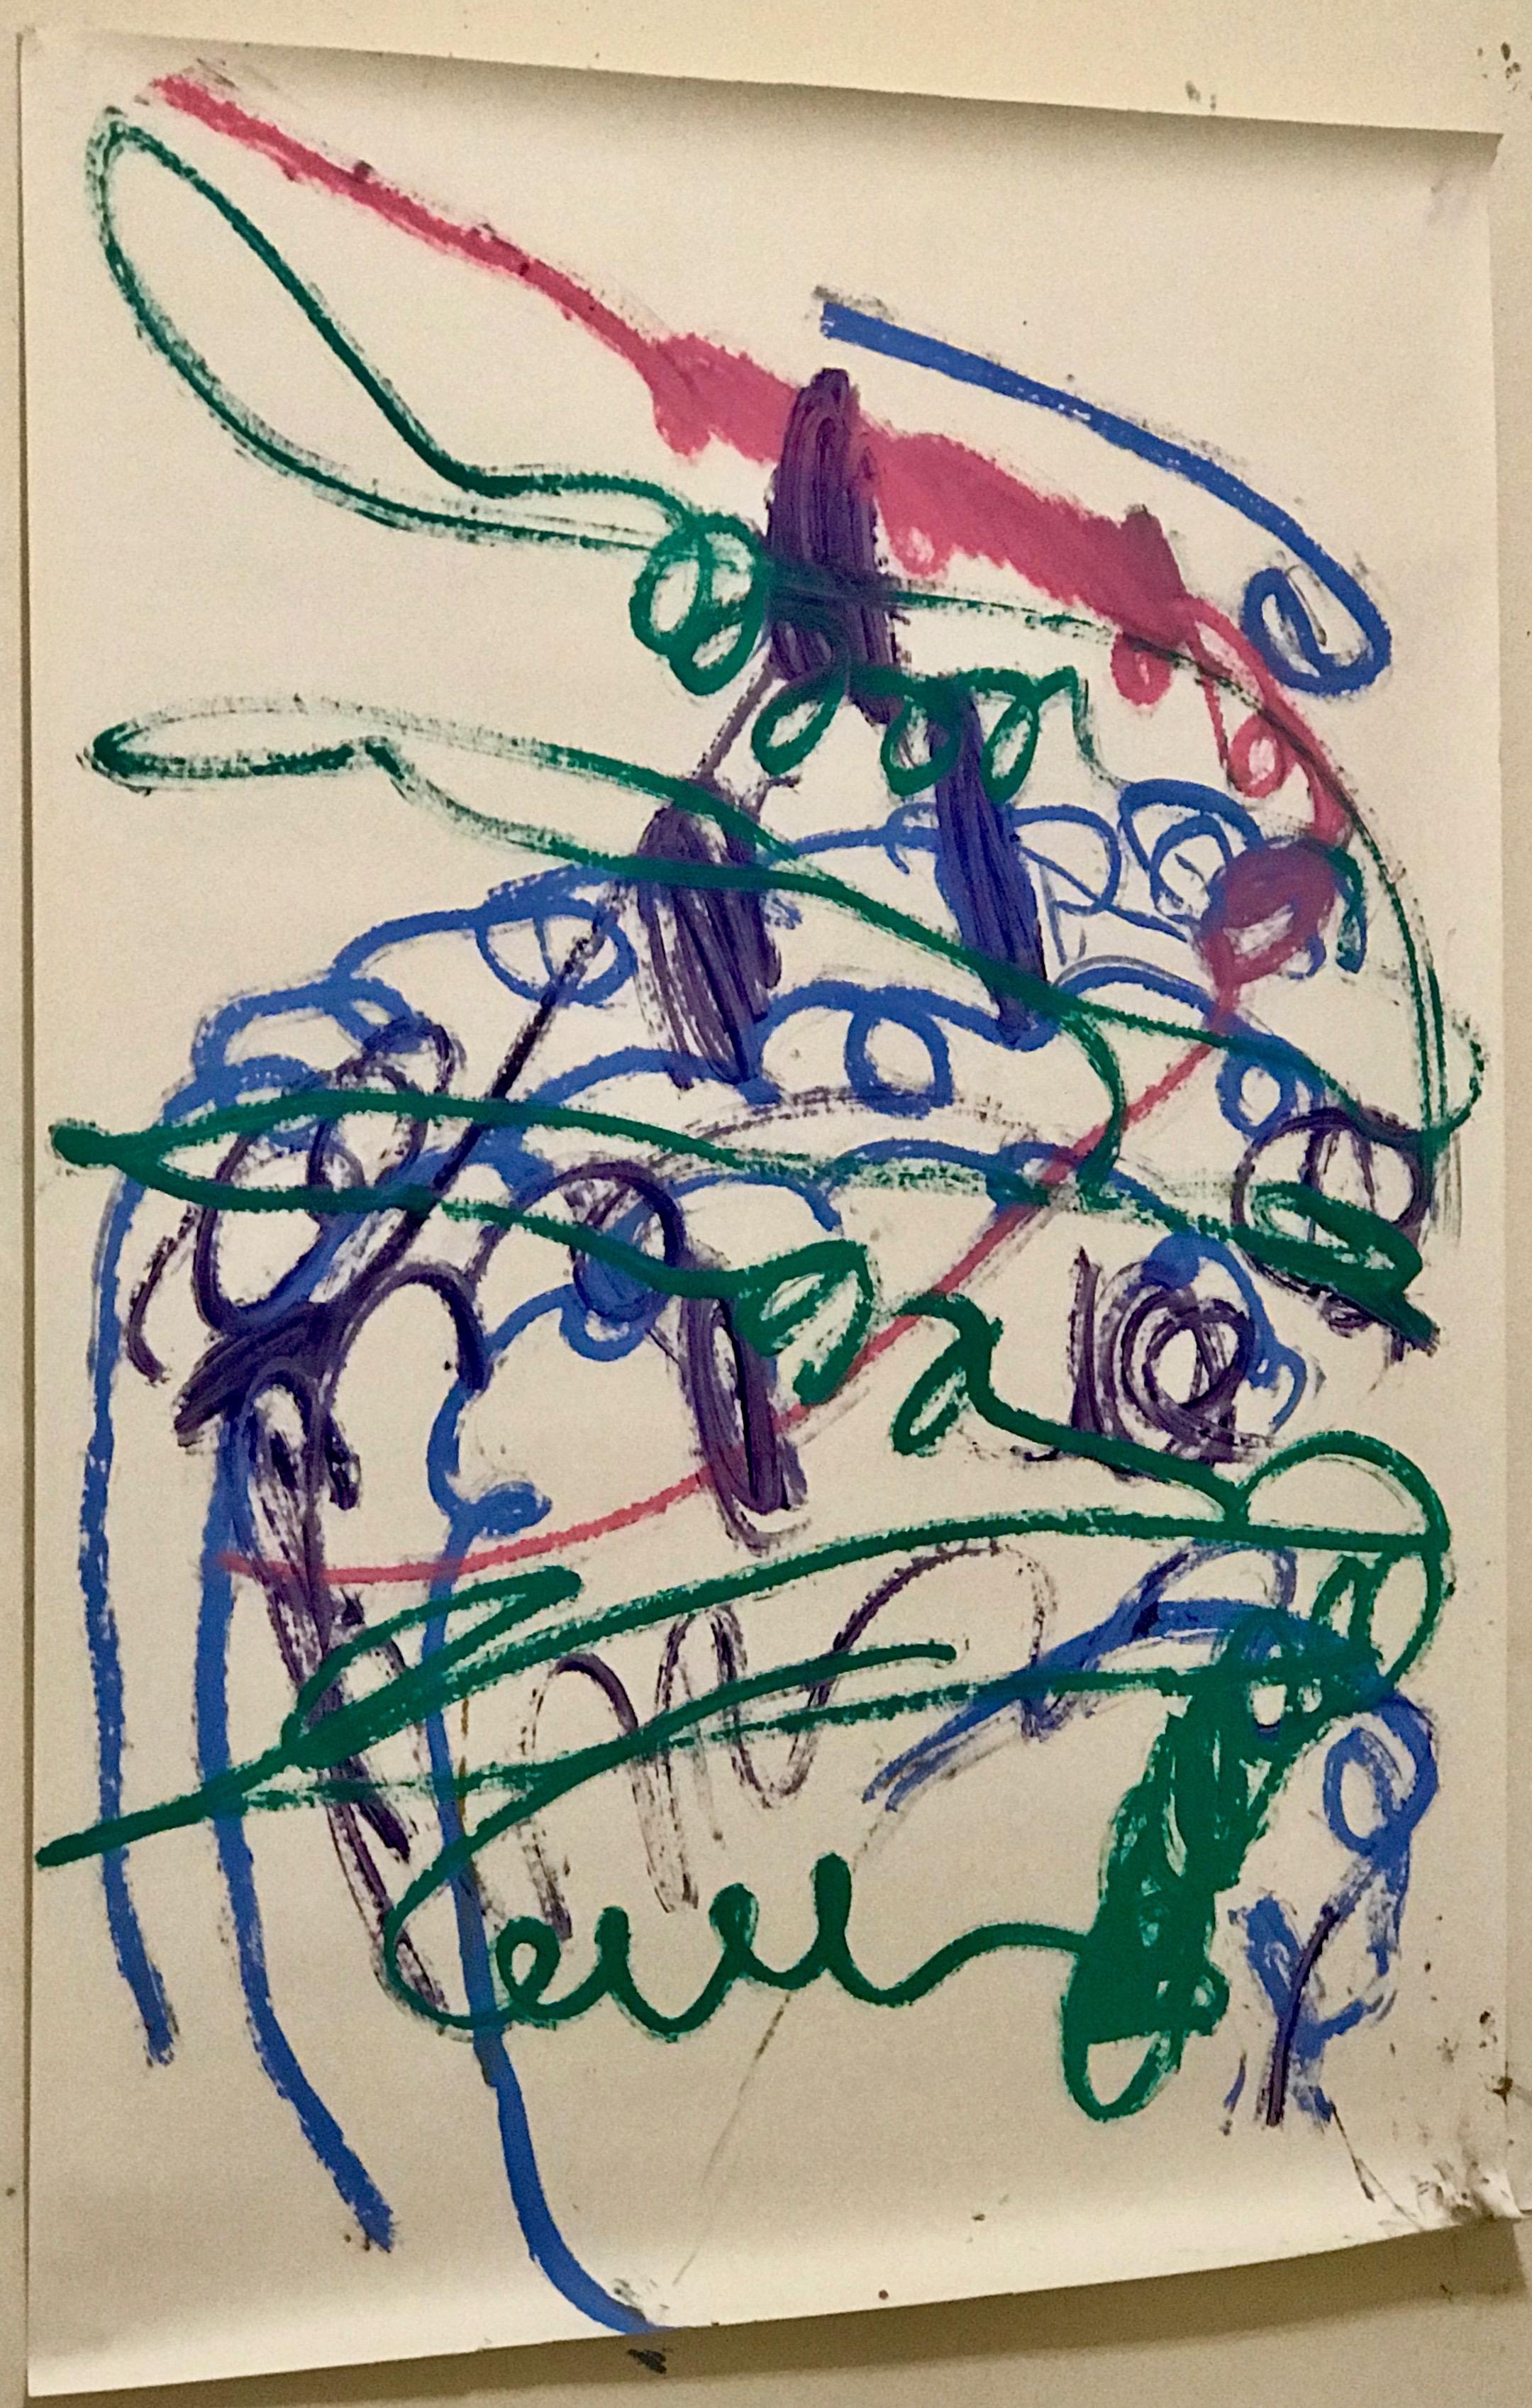 40 x 60  Oil stick on paper.